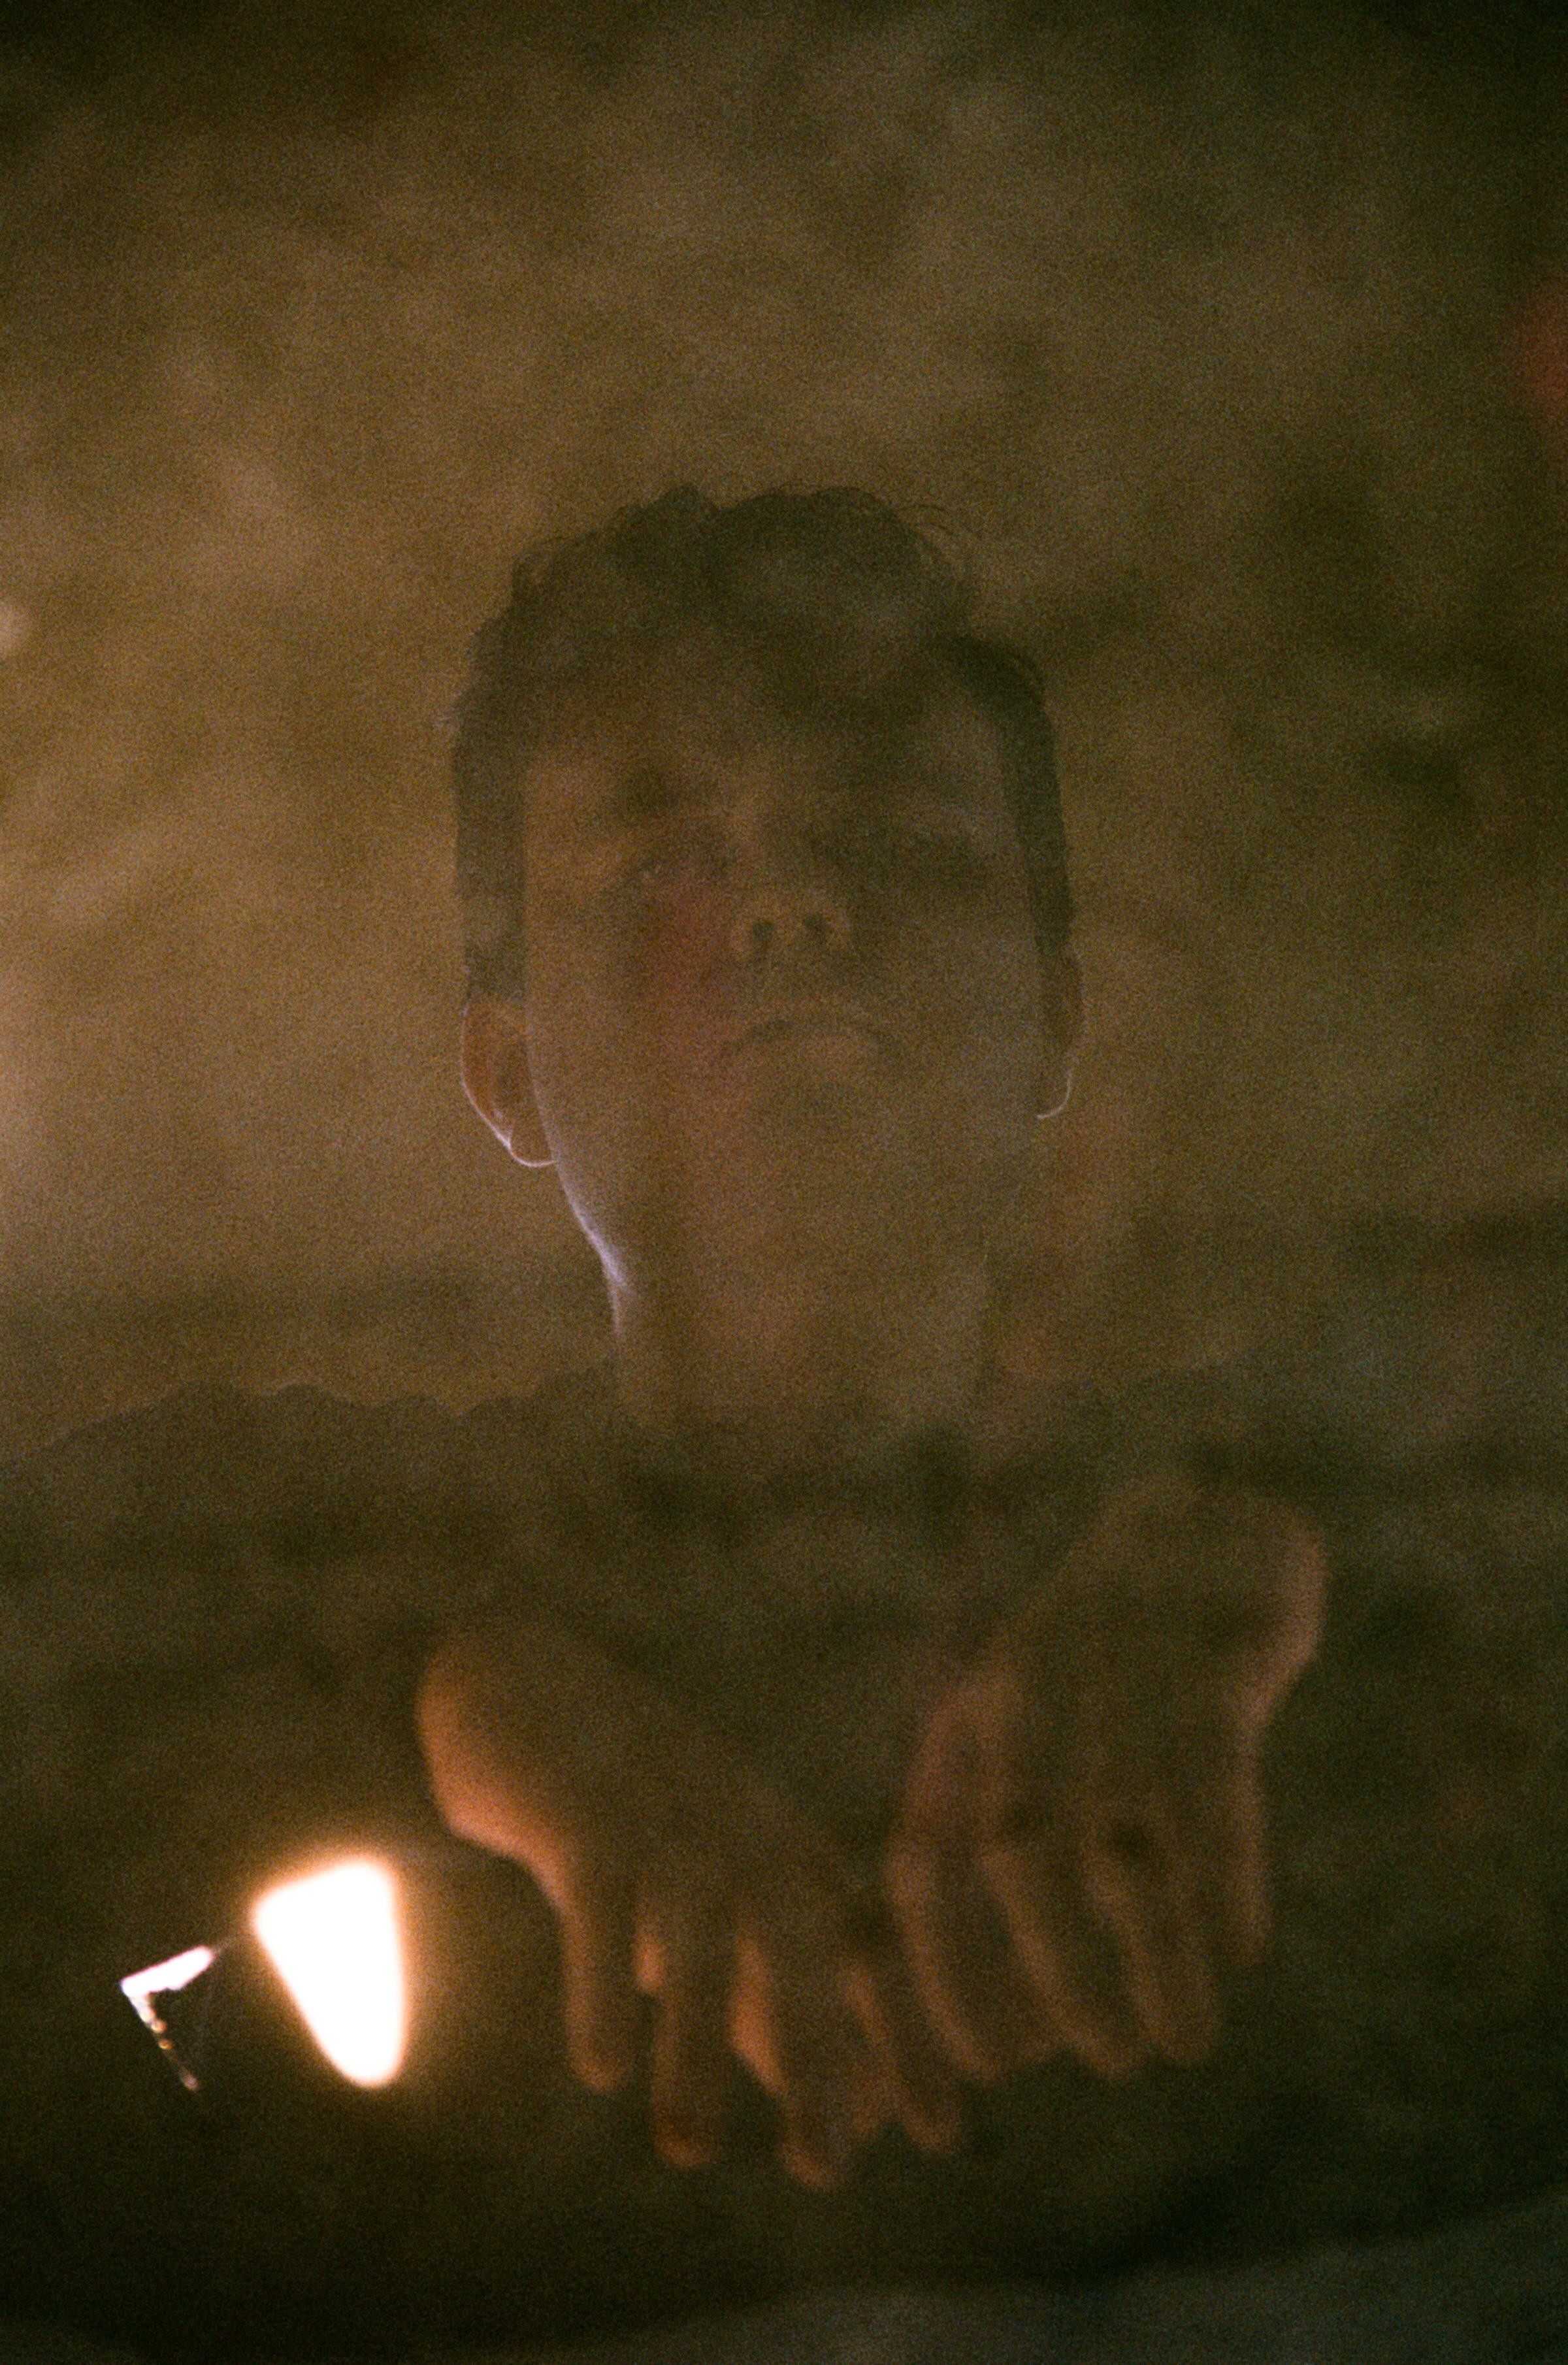 SAMO, played by Theo Murray